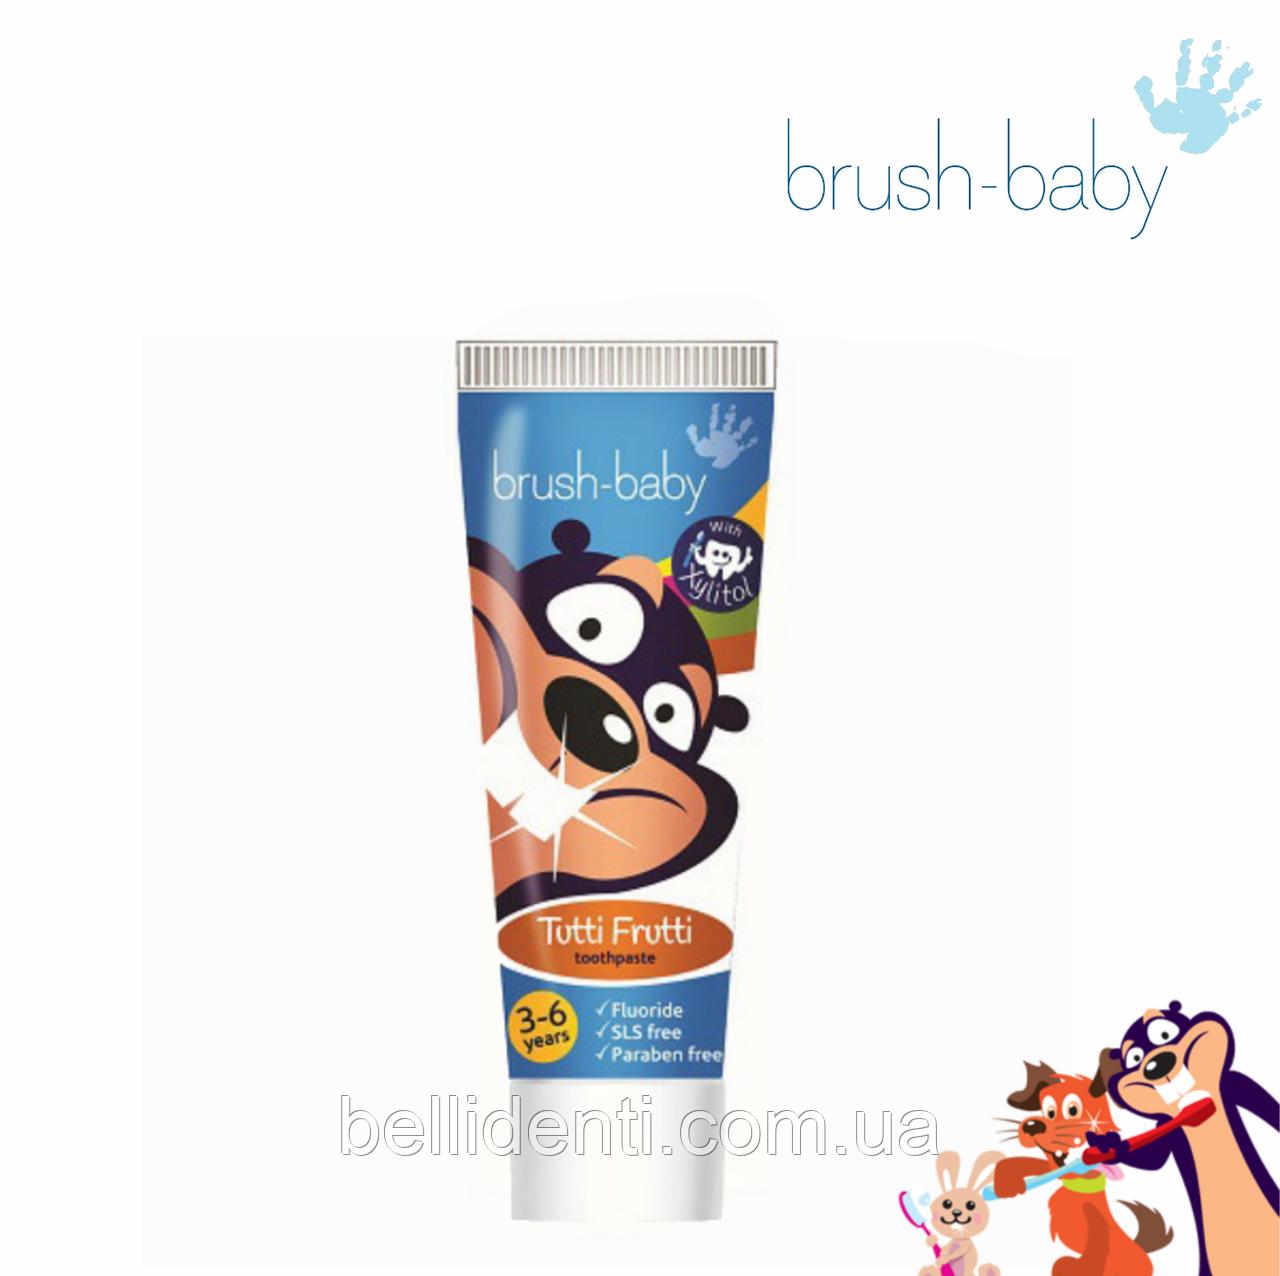 Зубная паста для детей Brush-Baby с Xylitol (3-6) фтор 1350 ppm, 50мл